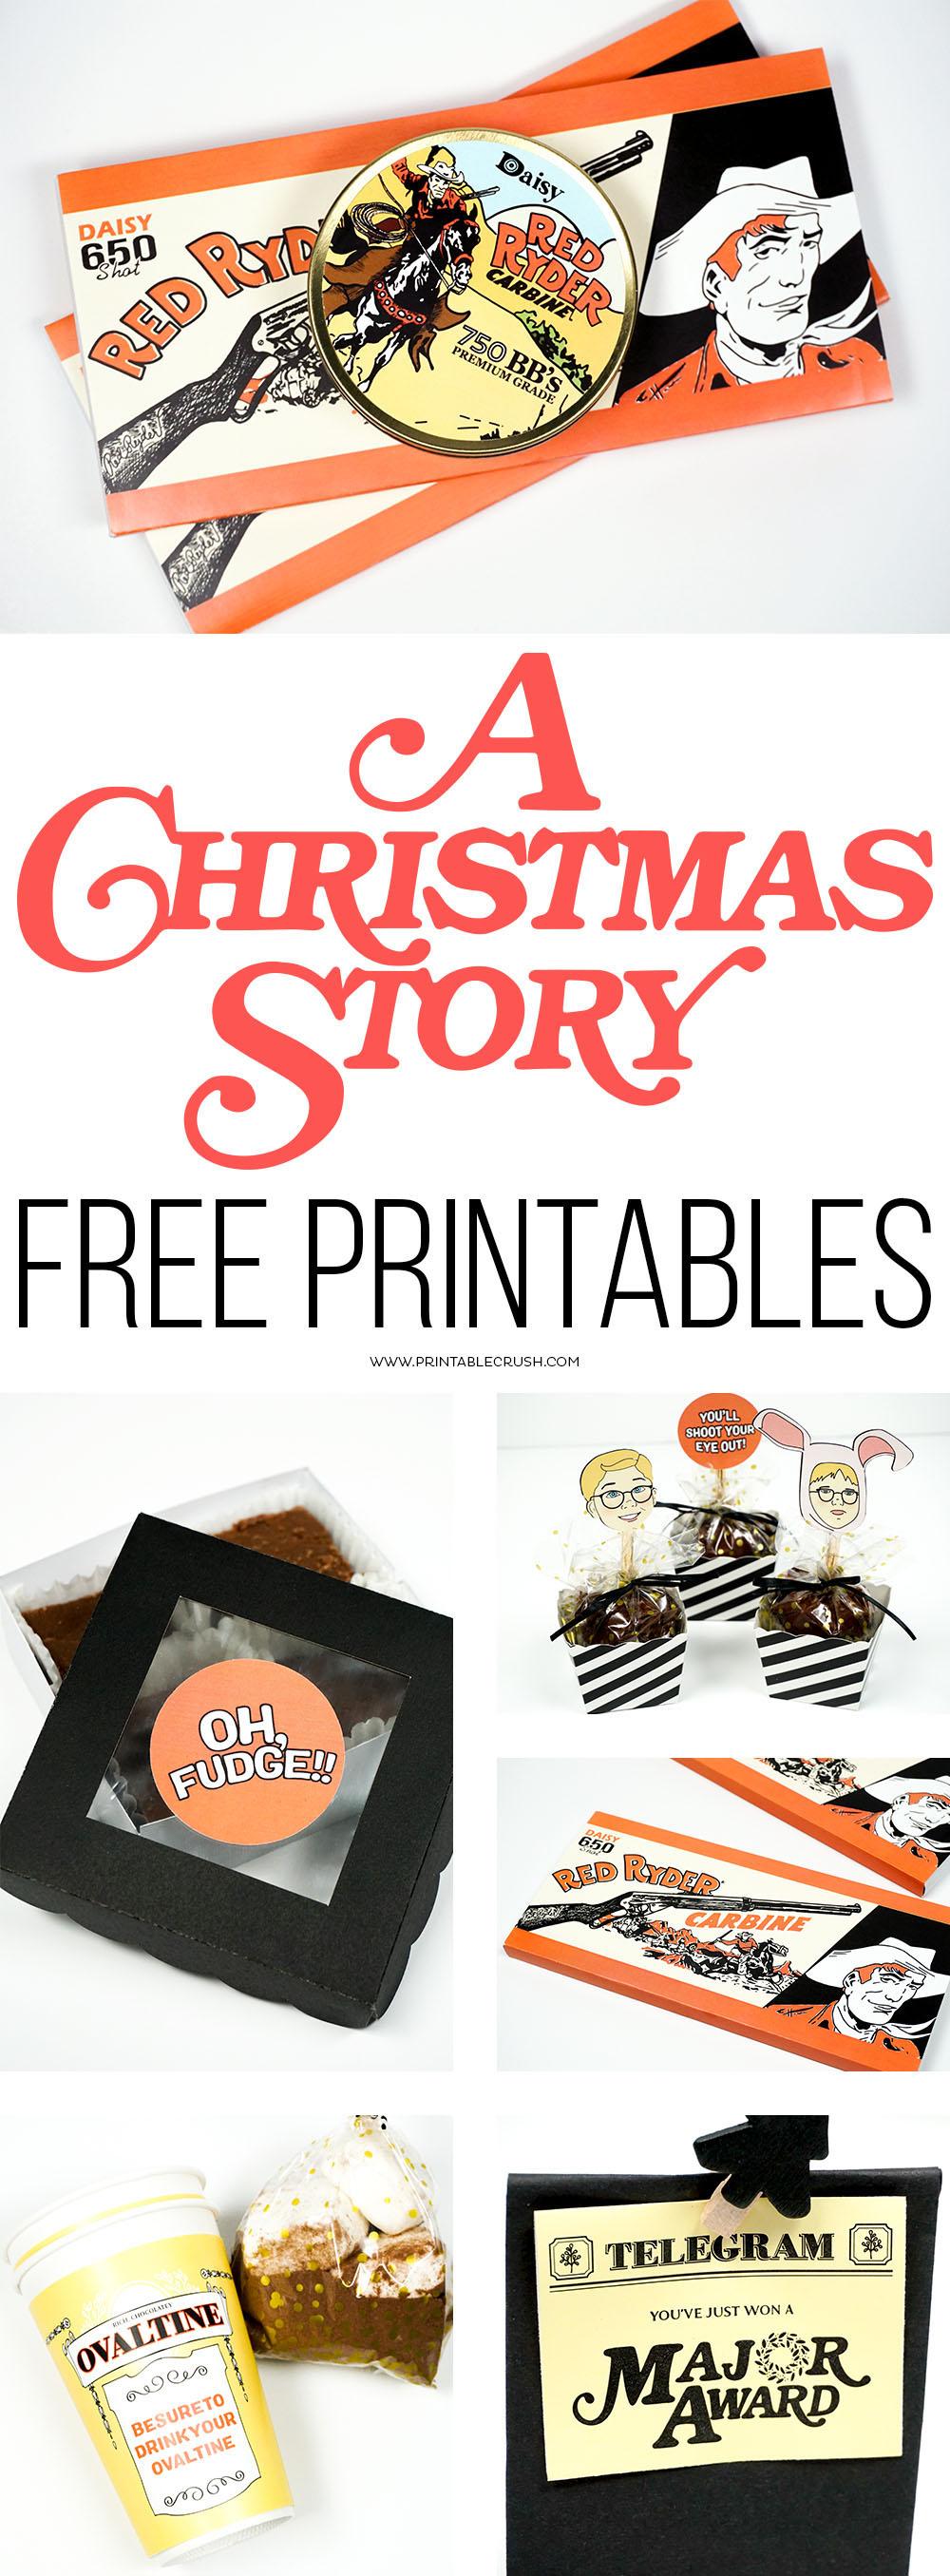 A Christmas Story FREE Printables